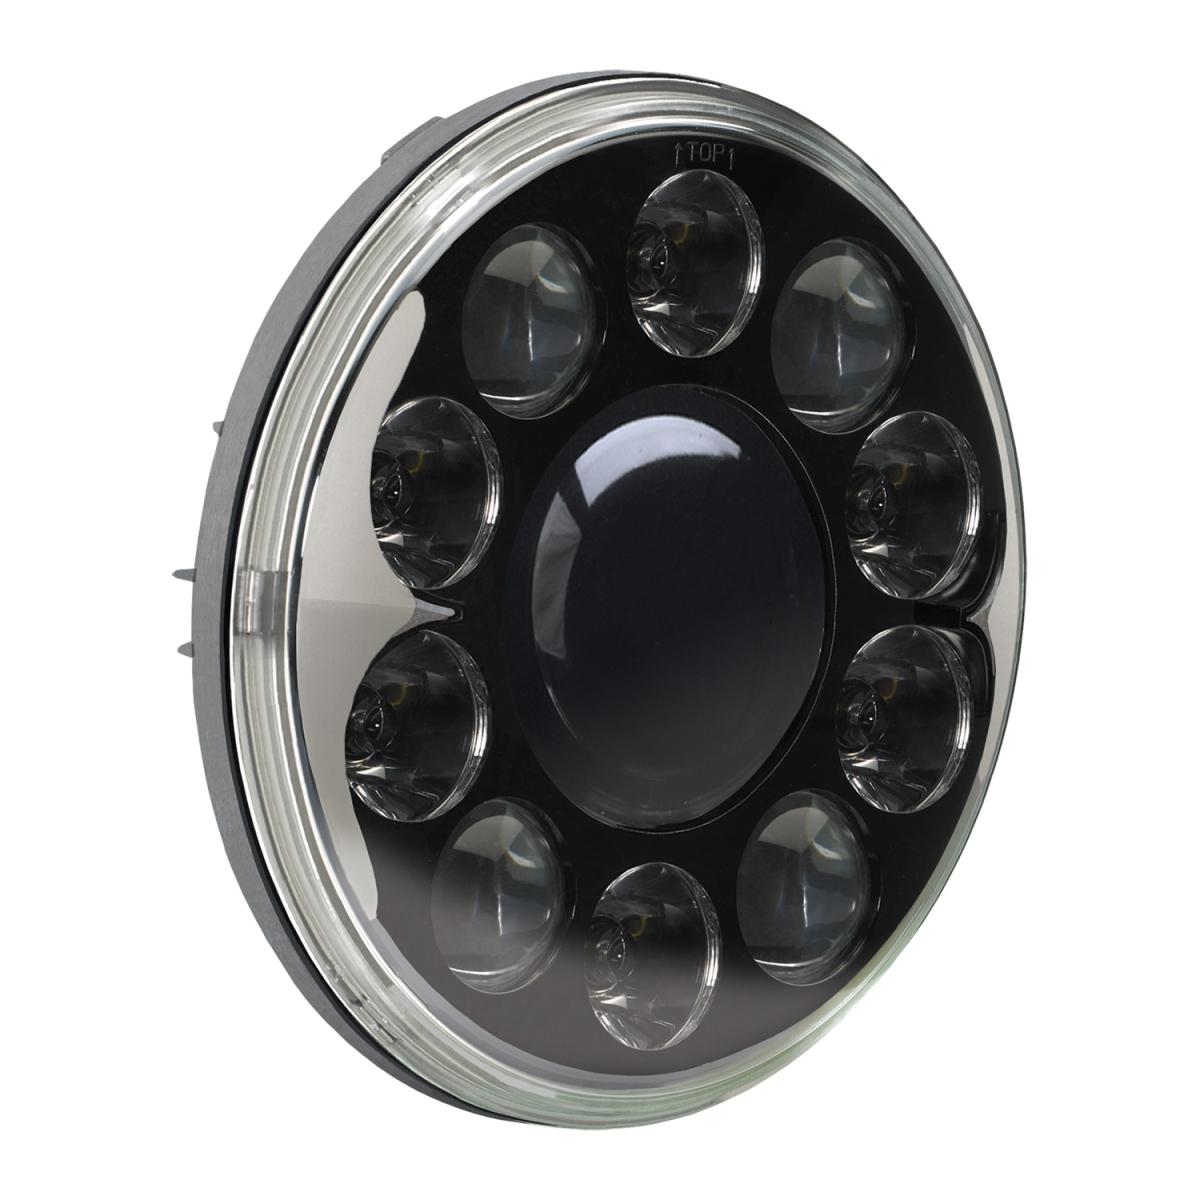 LED Headlight – Model 8770 Locomotive